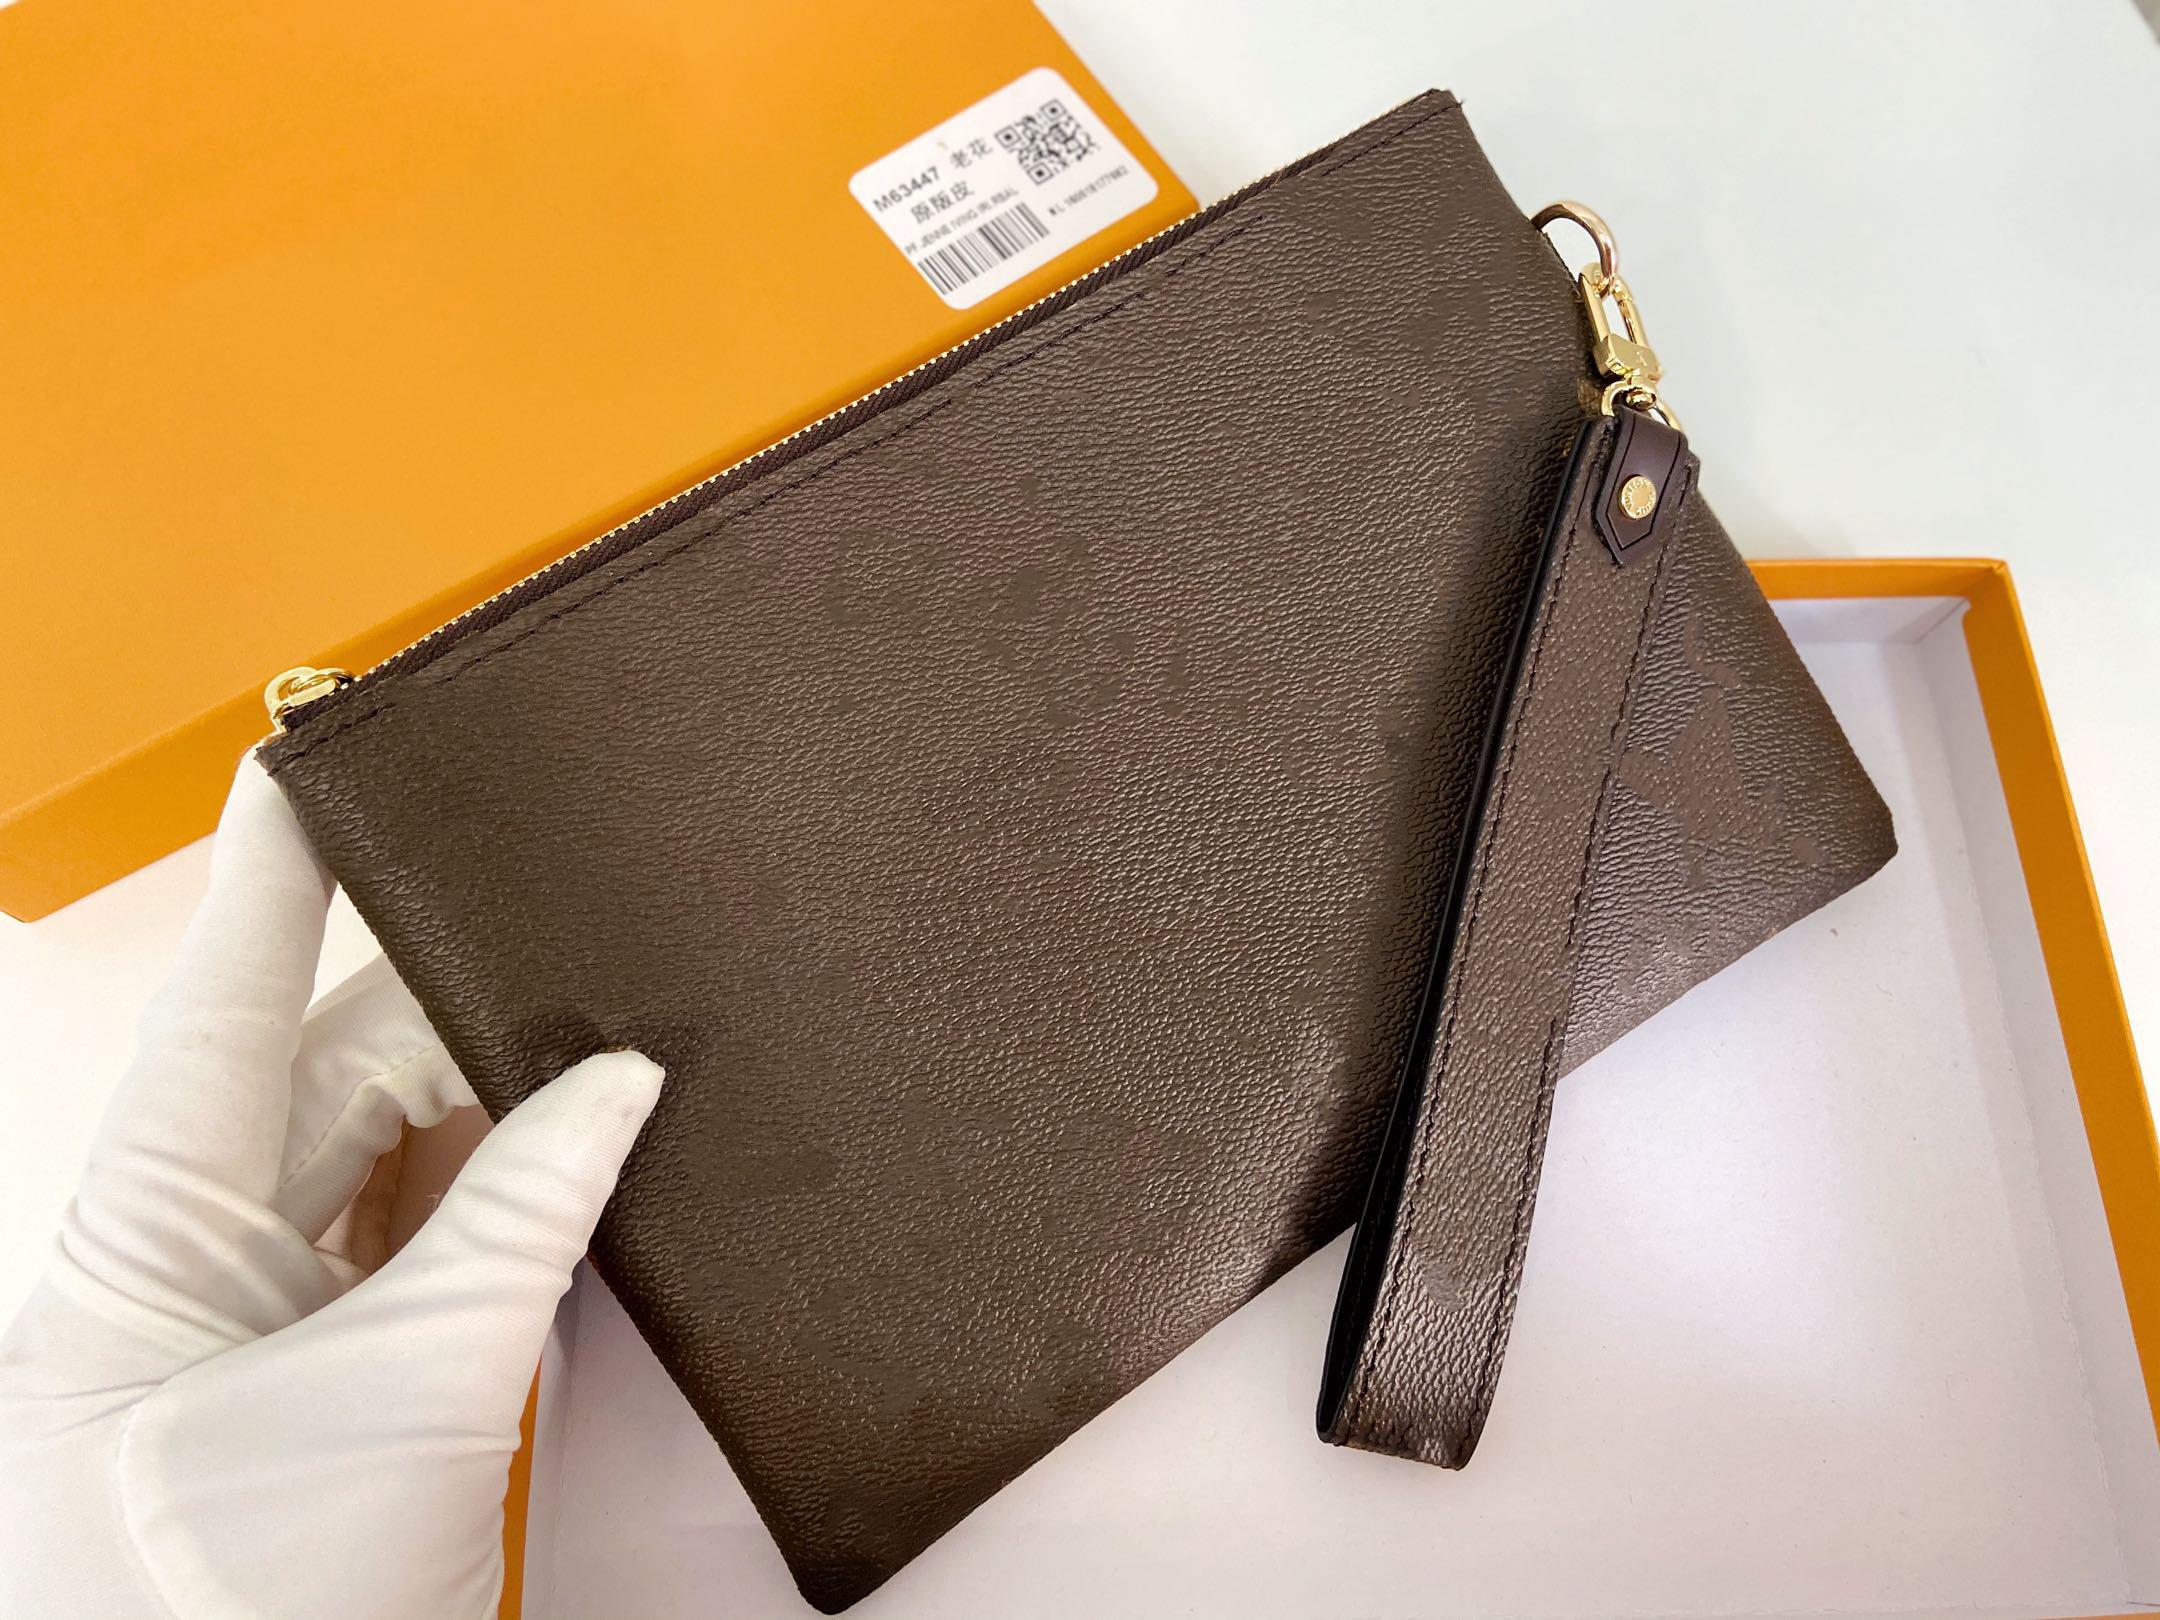 Luxury designer 2020 fashion ladies luxury bag city handbag designer ladies handbag purse luxury fashion bag clutch bag small wallet#